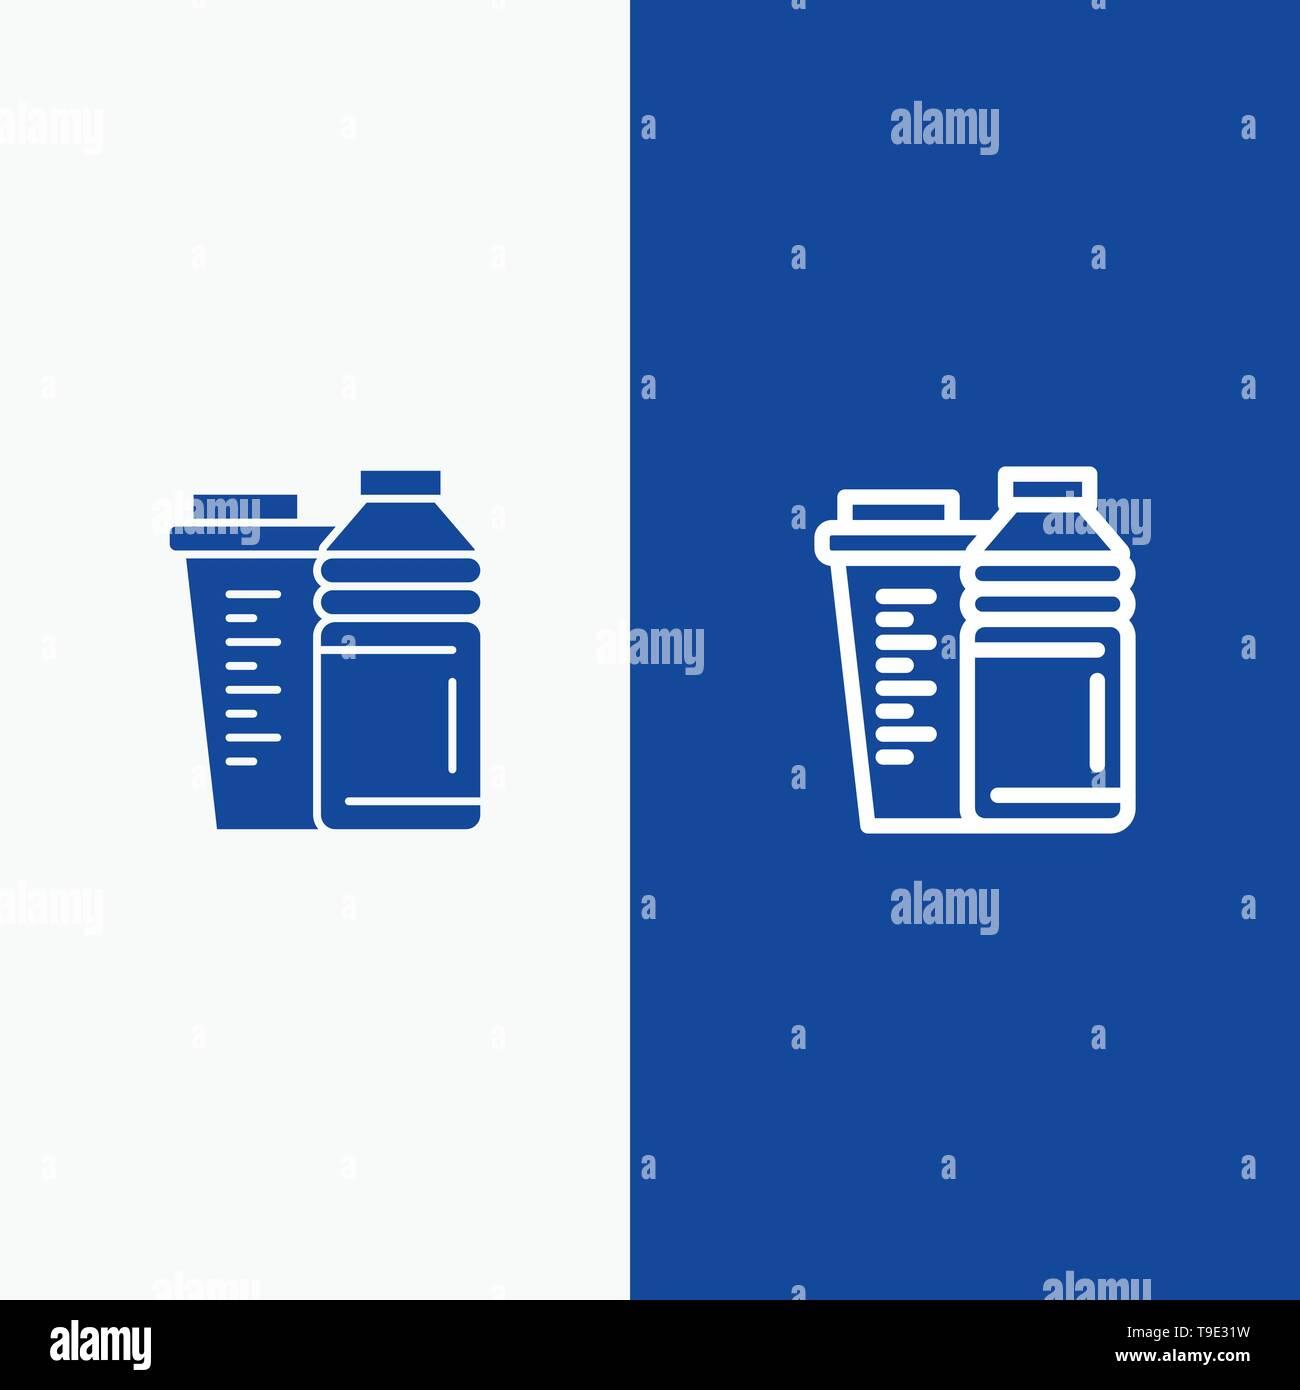 Bottle, Drink, Energy, Shaker, Sport Line and Glyph Solid icon Blue banner Line and Glyph Solid icon Blue banner - Stock Image